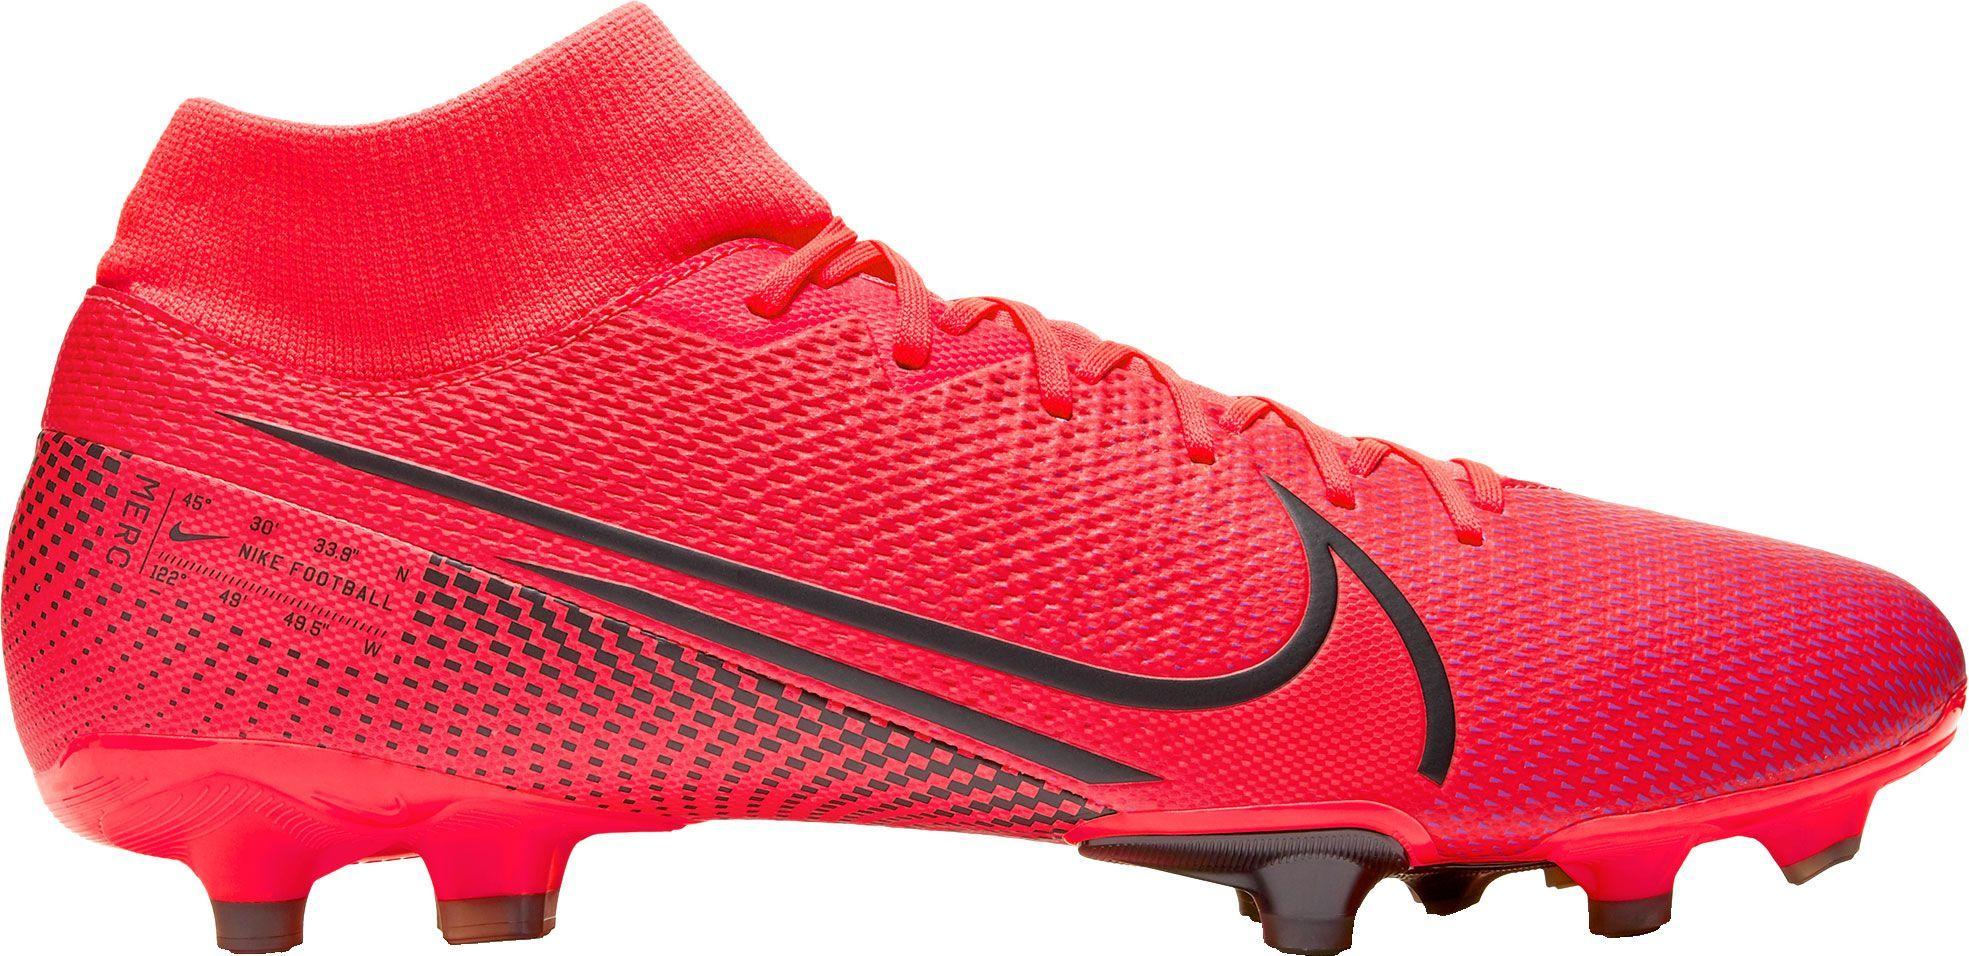 Nike Mercurial Superfly 7 Academy Fg Soccer Cleats Men S Red In 2020 Soccer Cleats Nike Mercurial Soccer Cleats Nike Soccer Boots